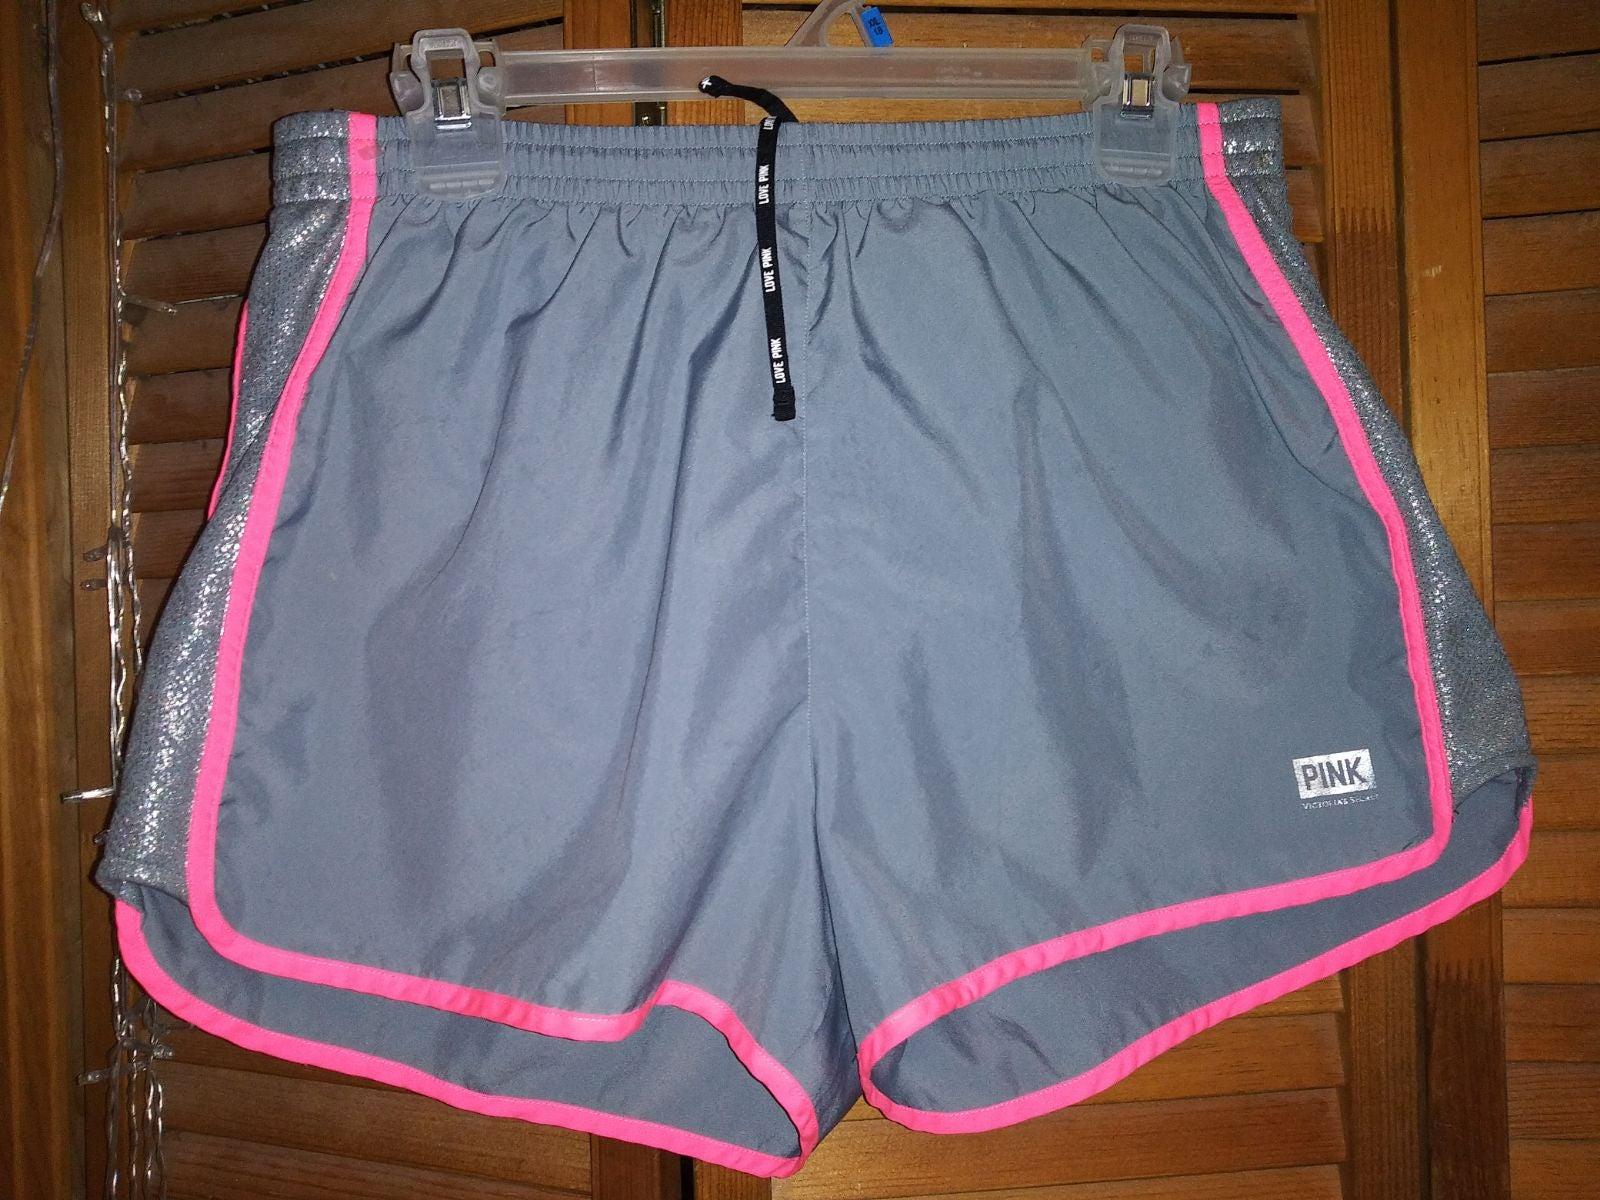 LG PINK VS Bling Athletic Shorts